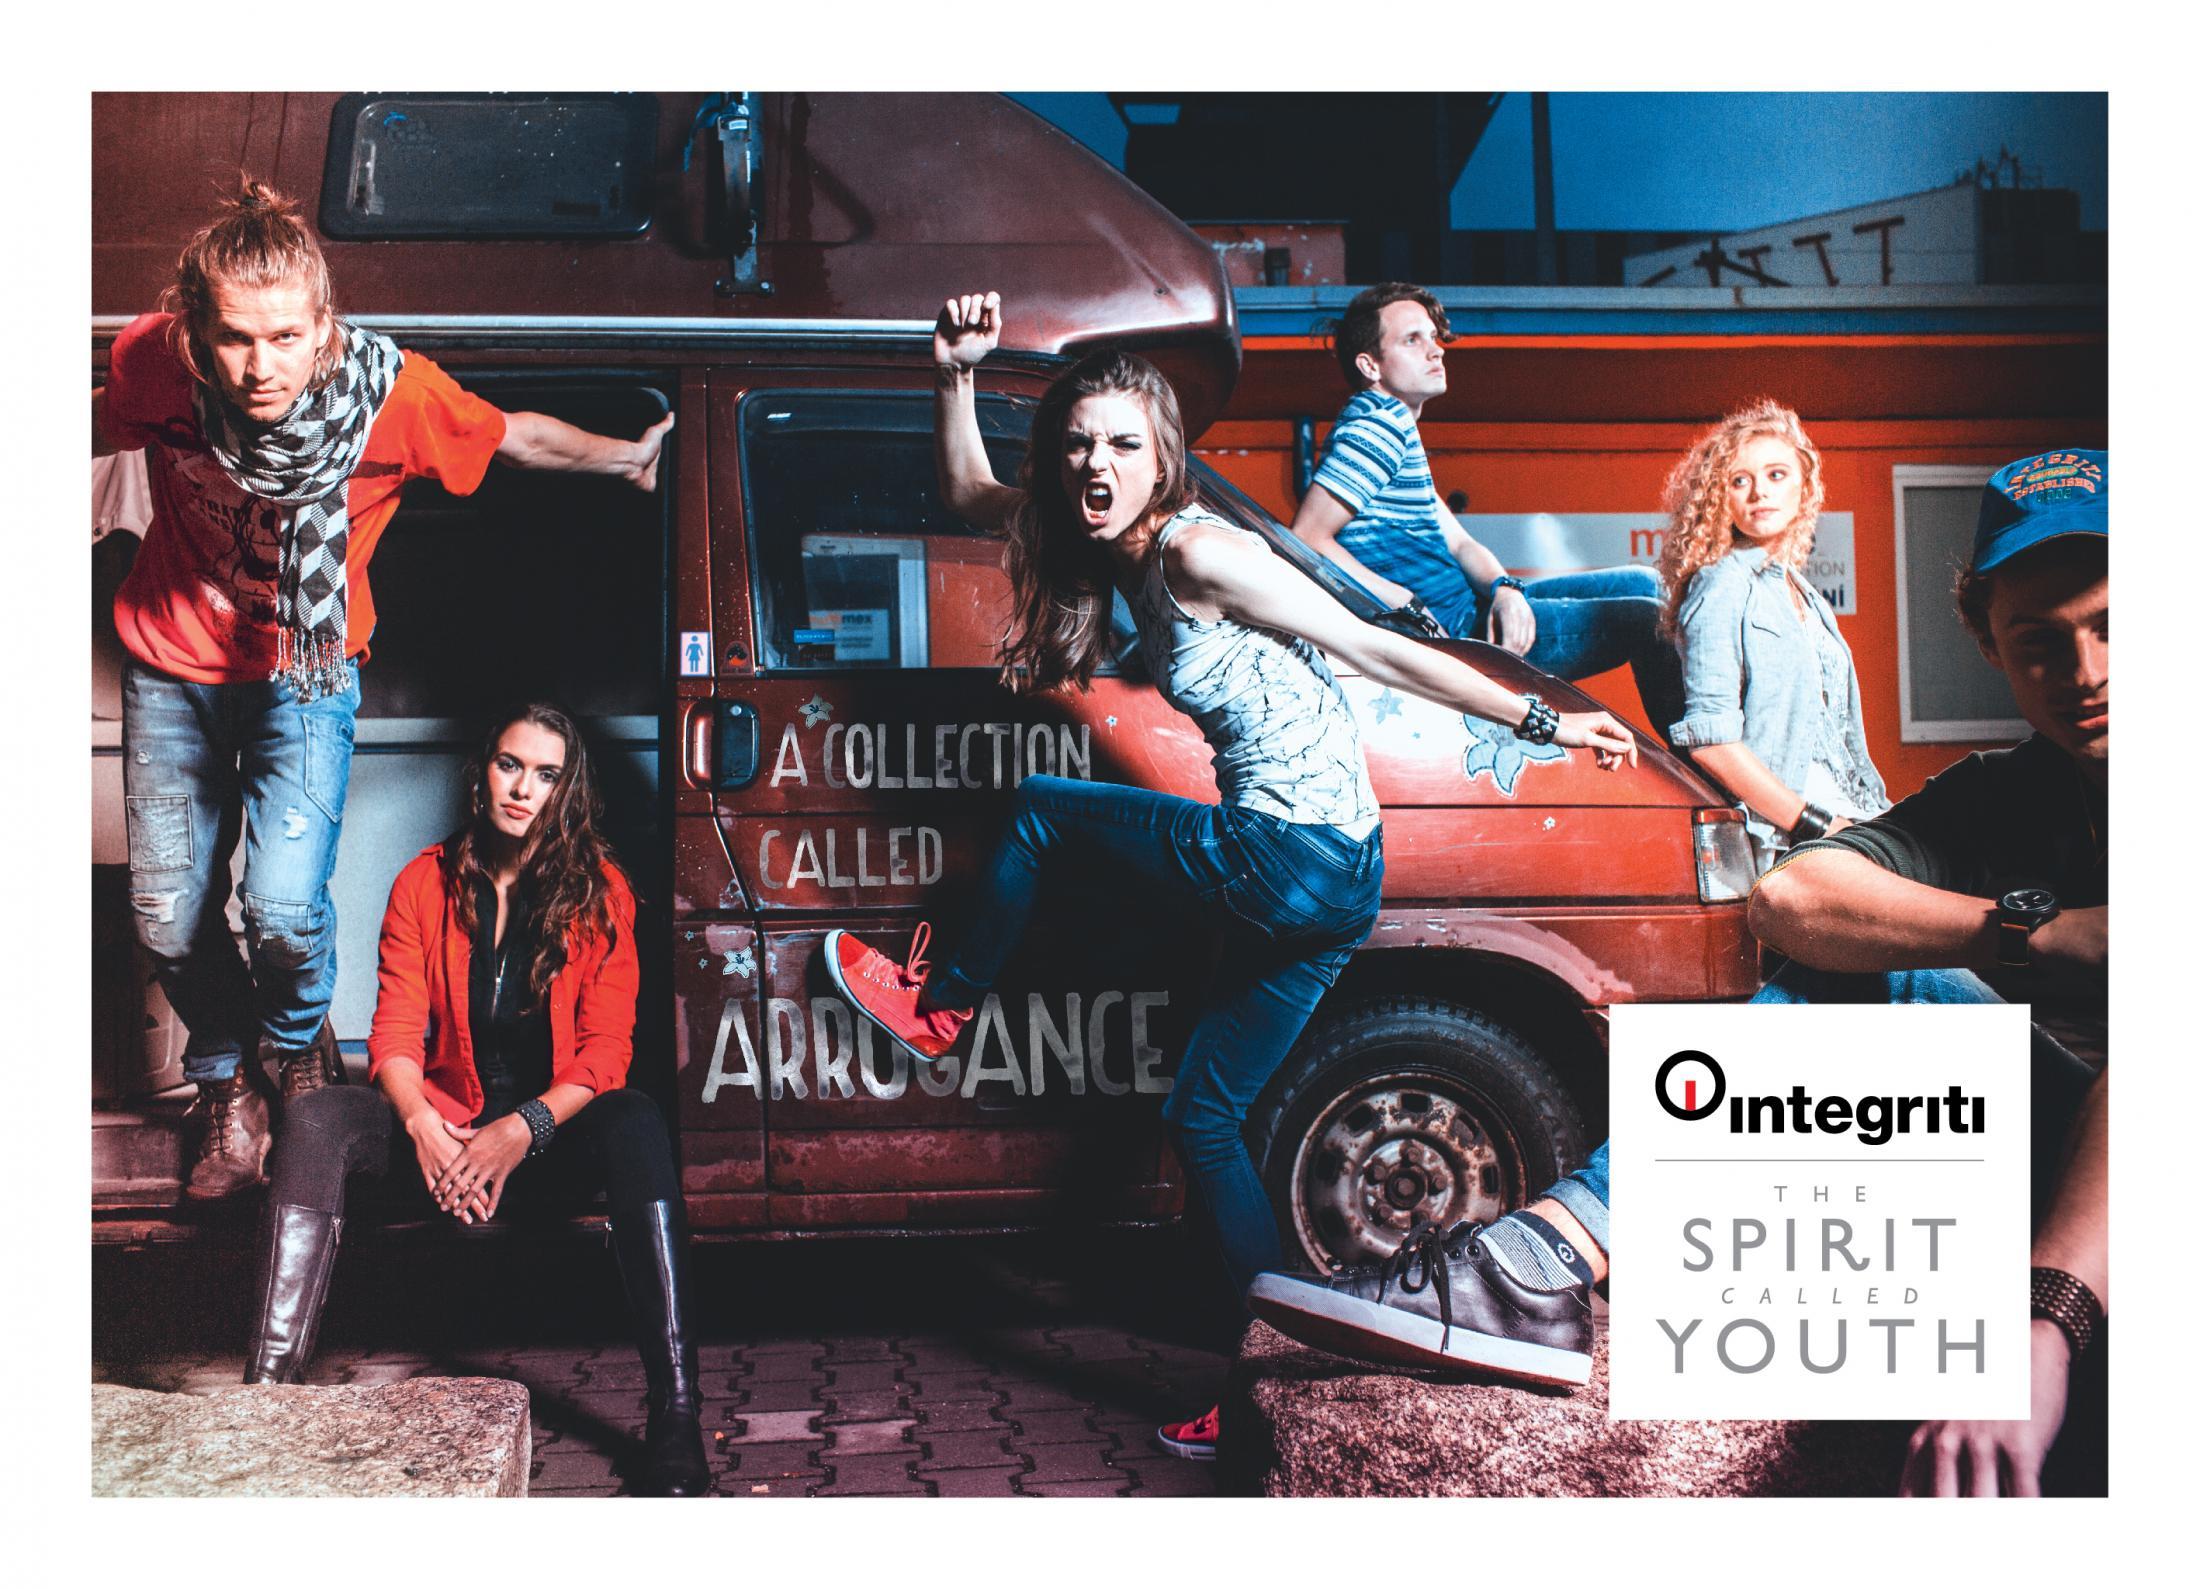 Integriti Print Ad - The spirit called youth, 3